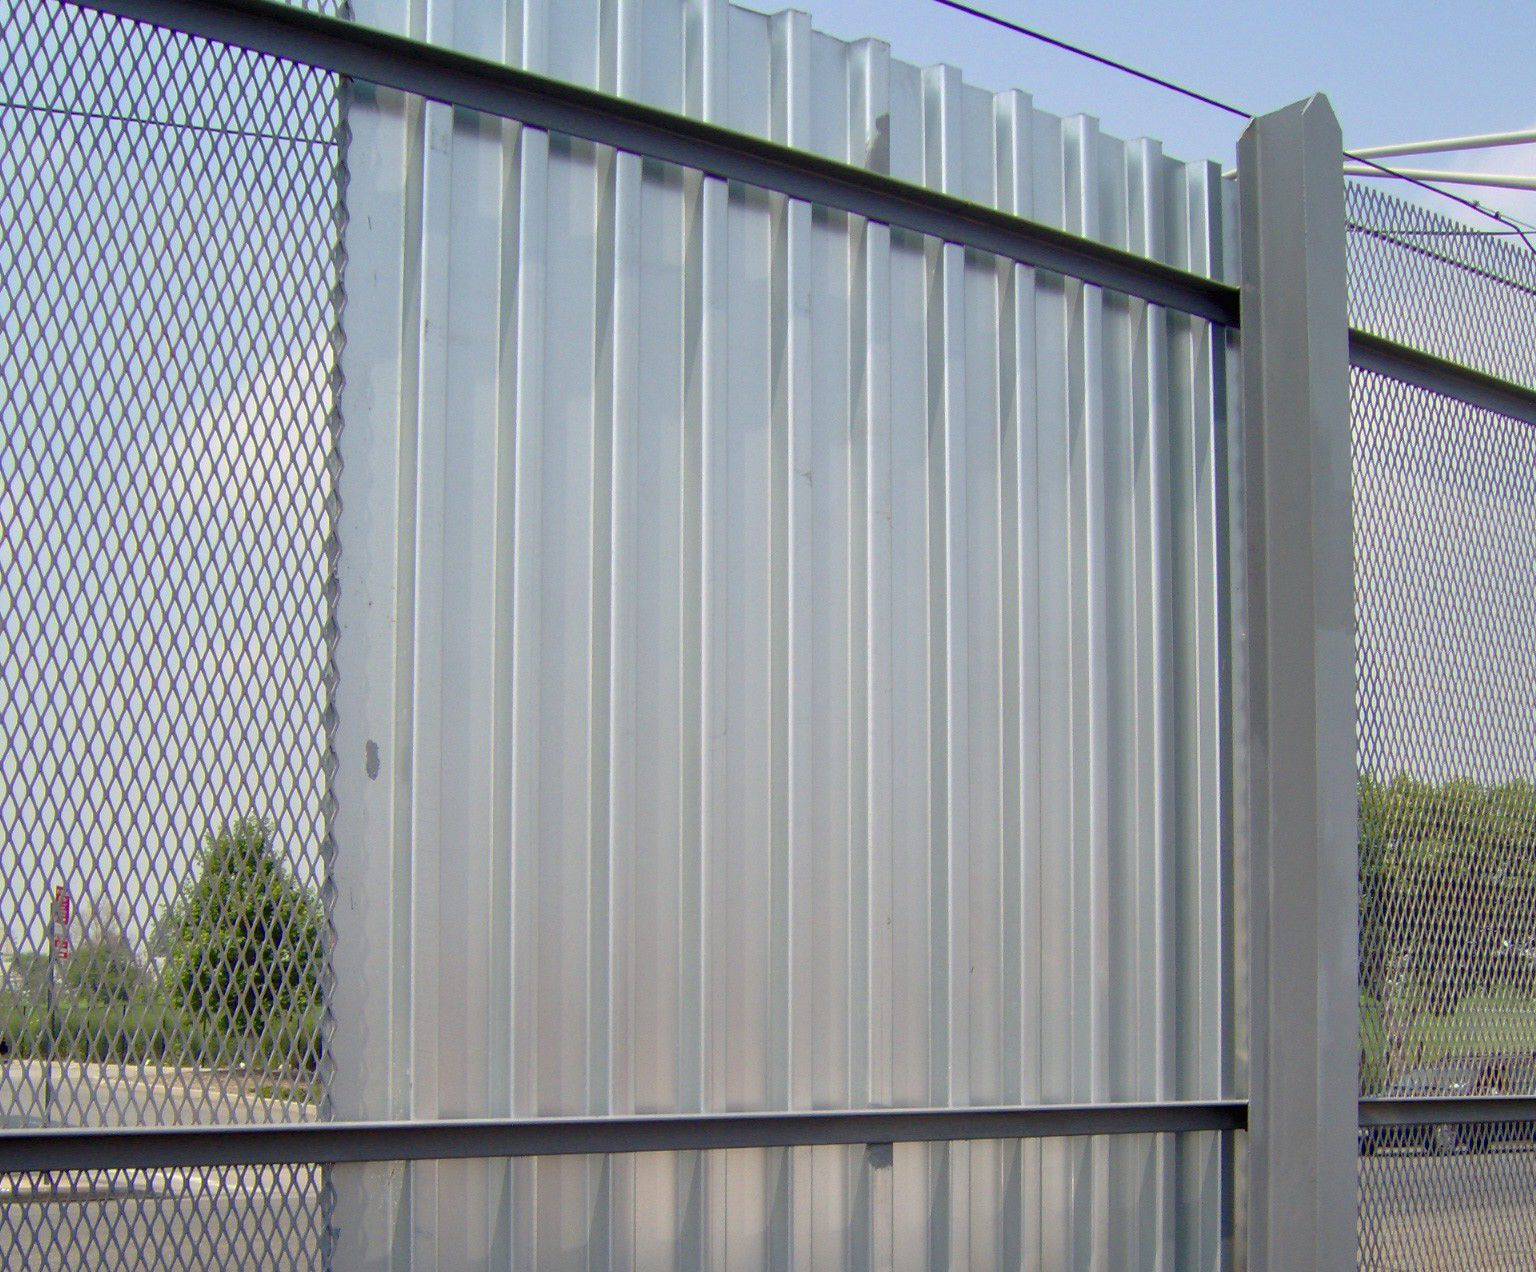 corrugated metal fence panels. Corrugated Metal Fence Panels L